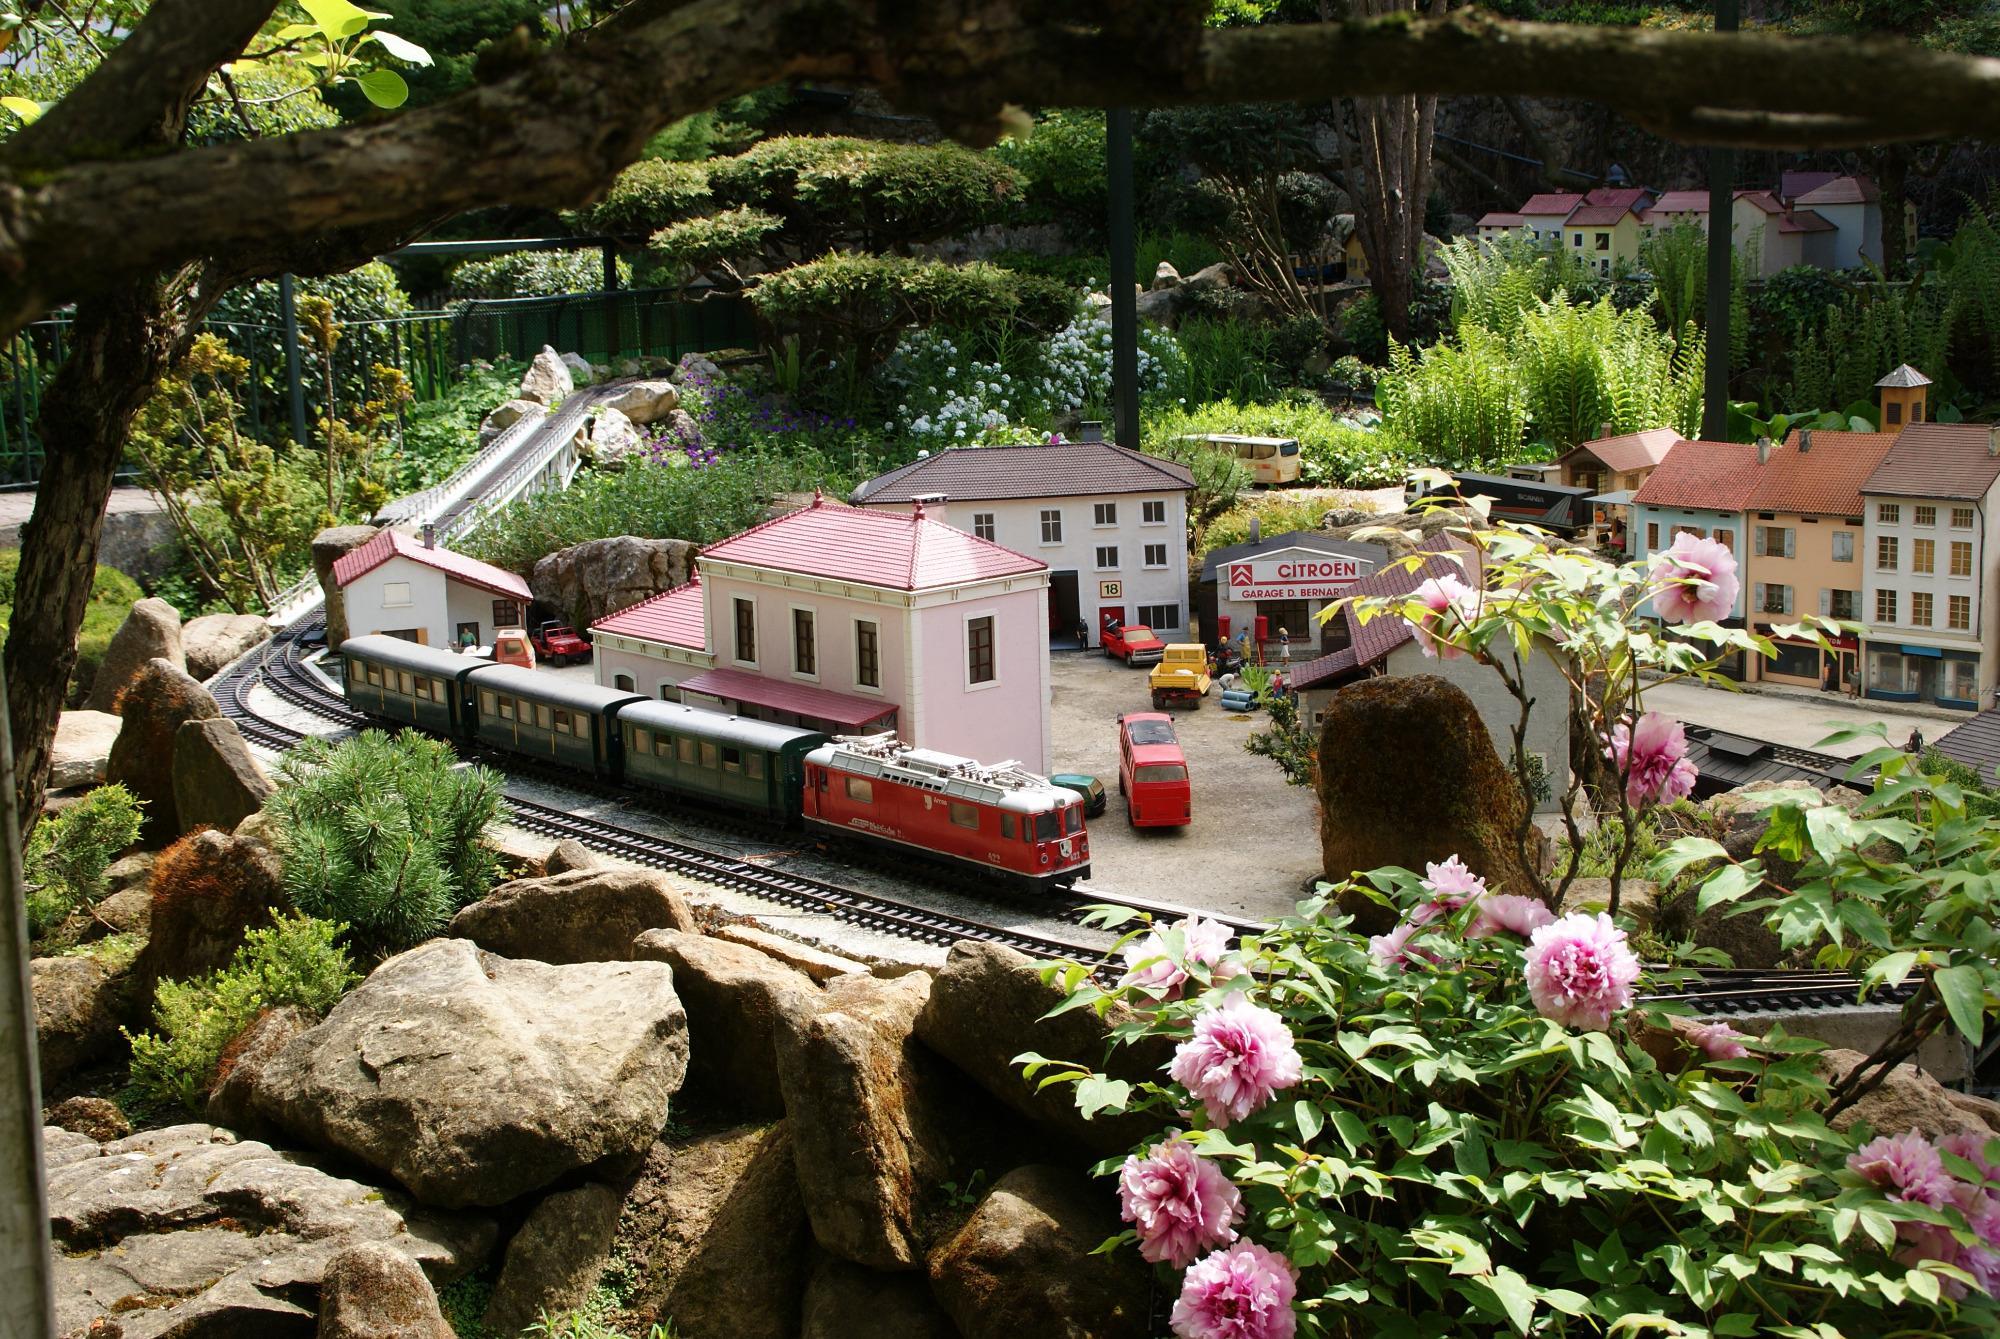 372-jardin-ferroviaire.jpg